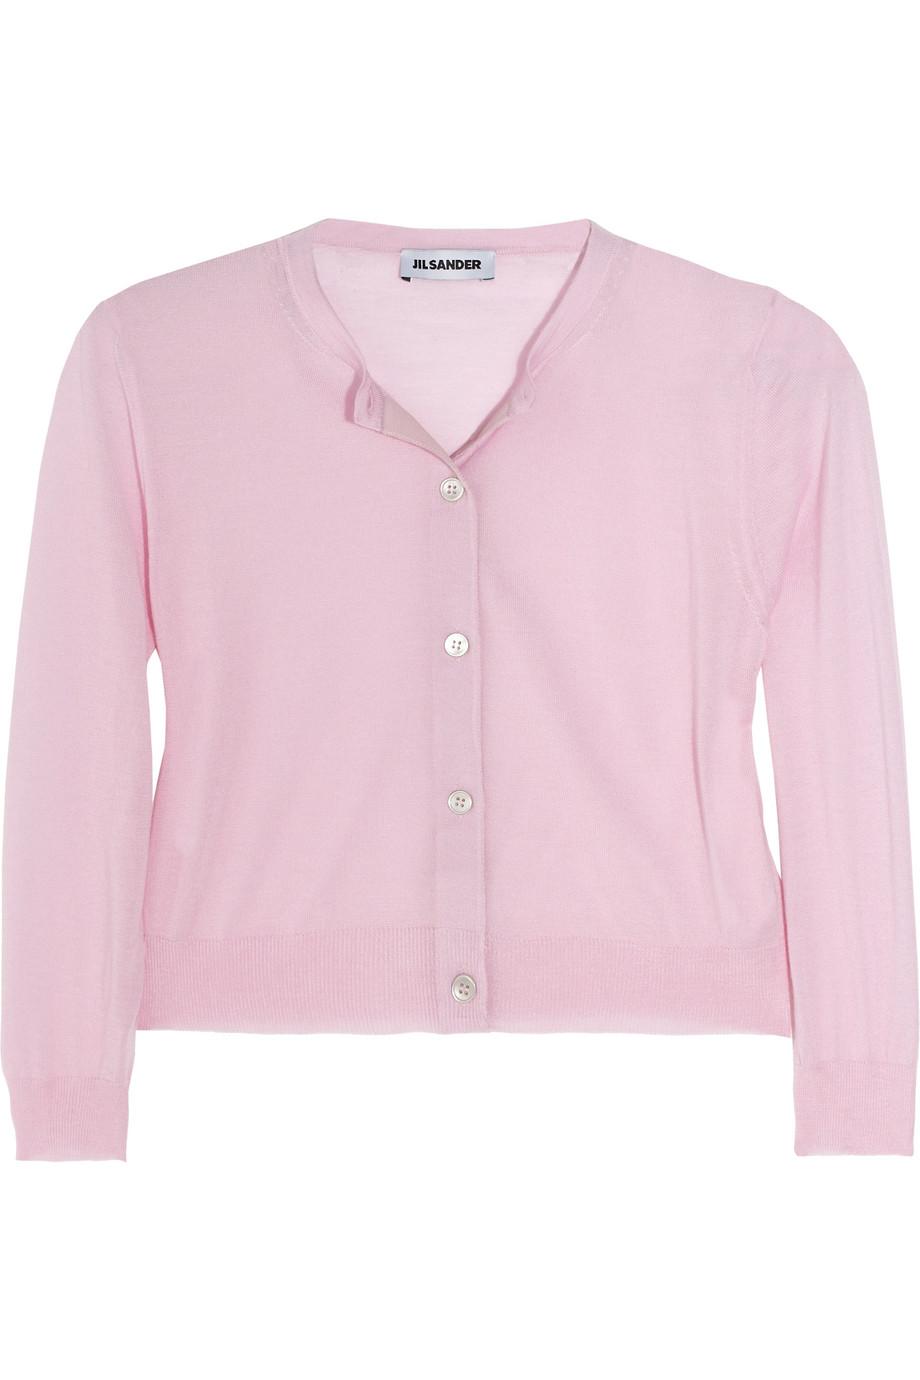 Jil sander Cropped Fine-Knit Cashmere Cardigan in Pink | Lyst